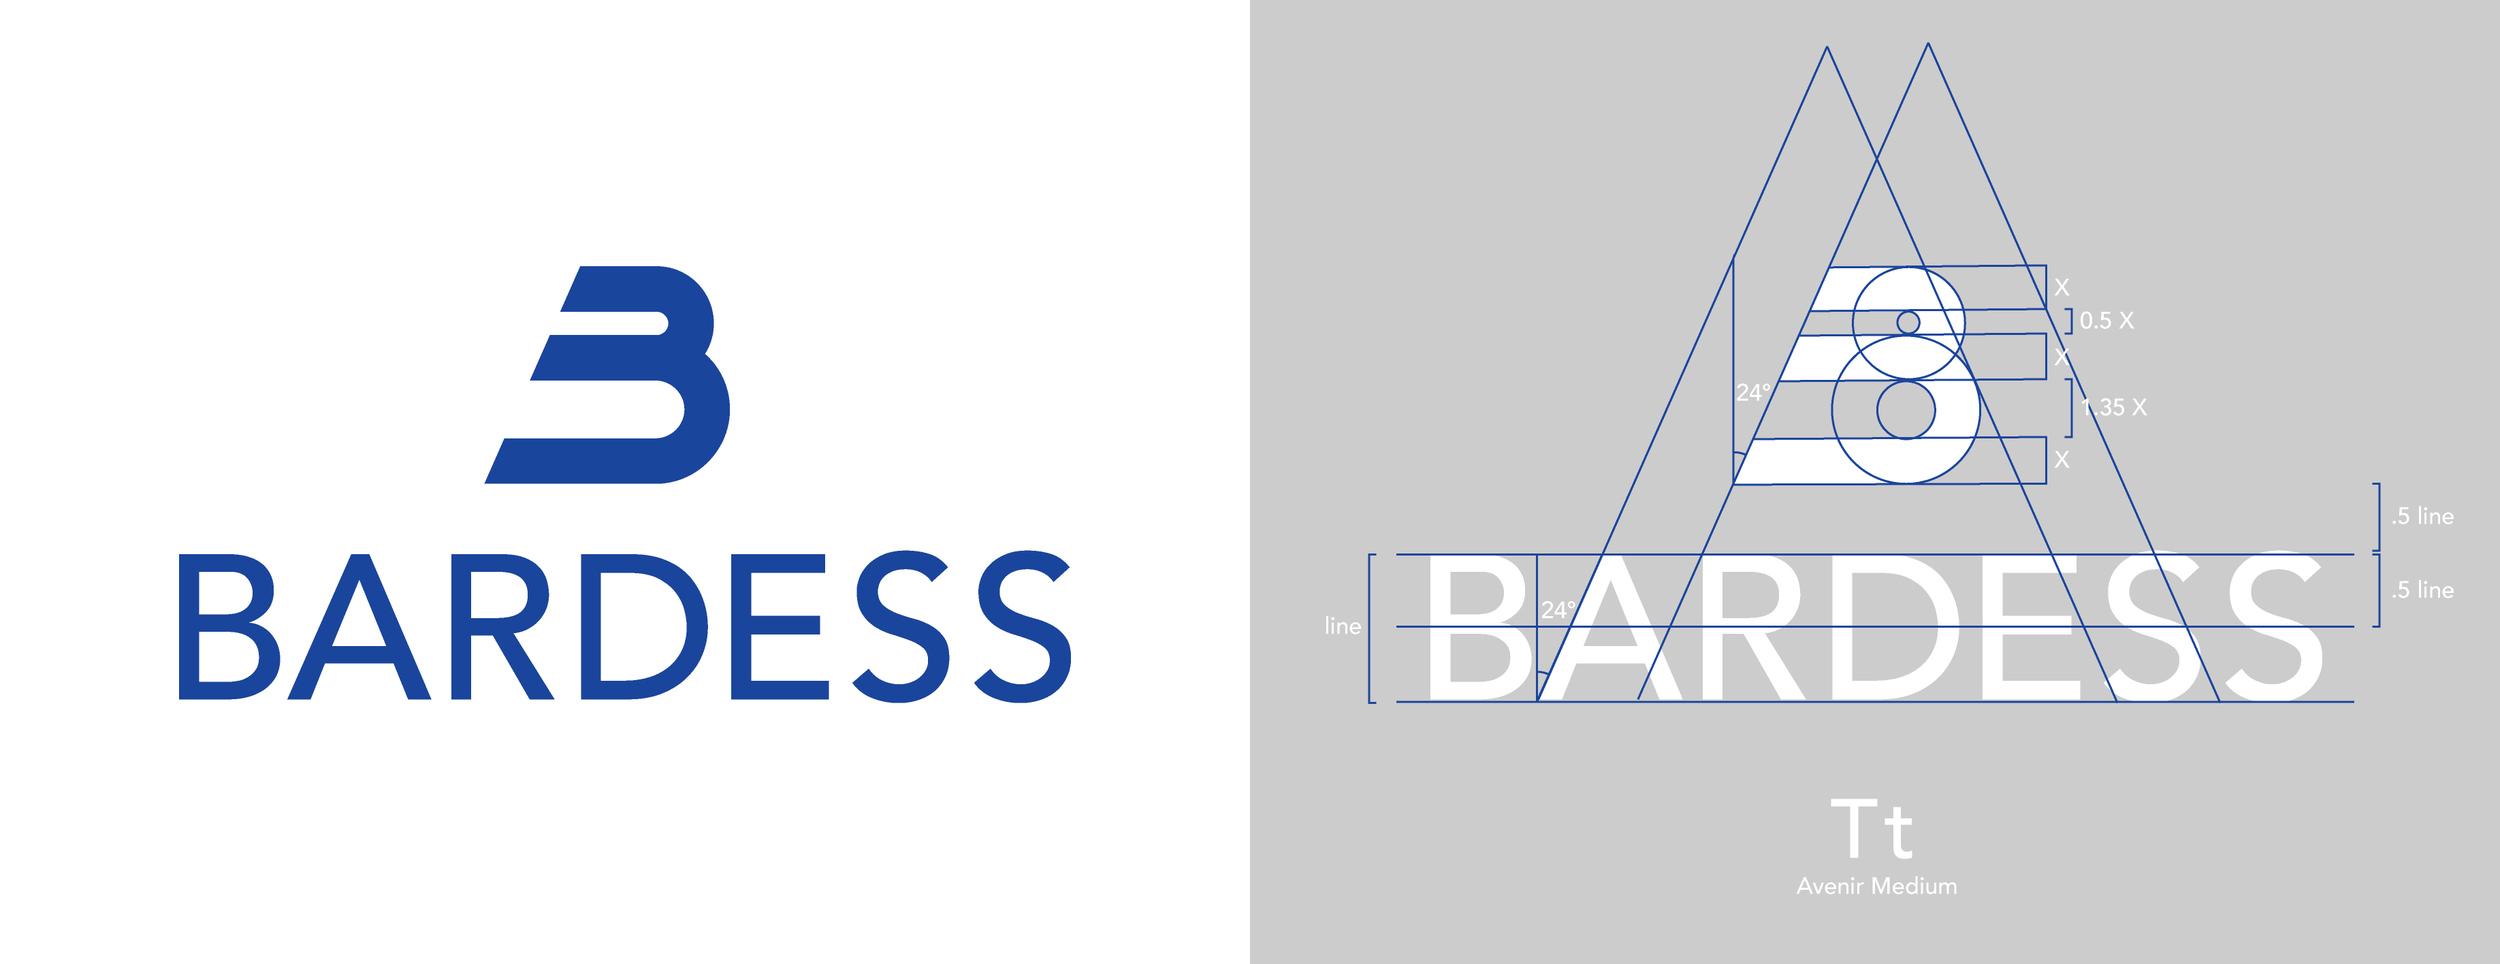 Bardess-Measure.jpg